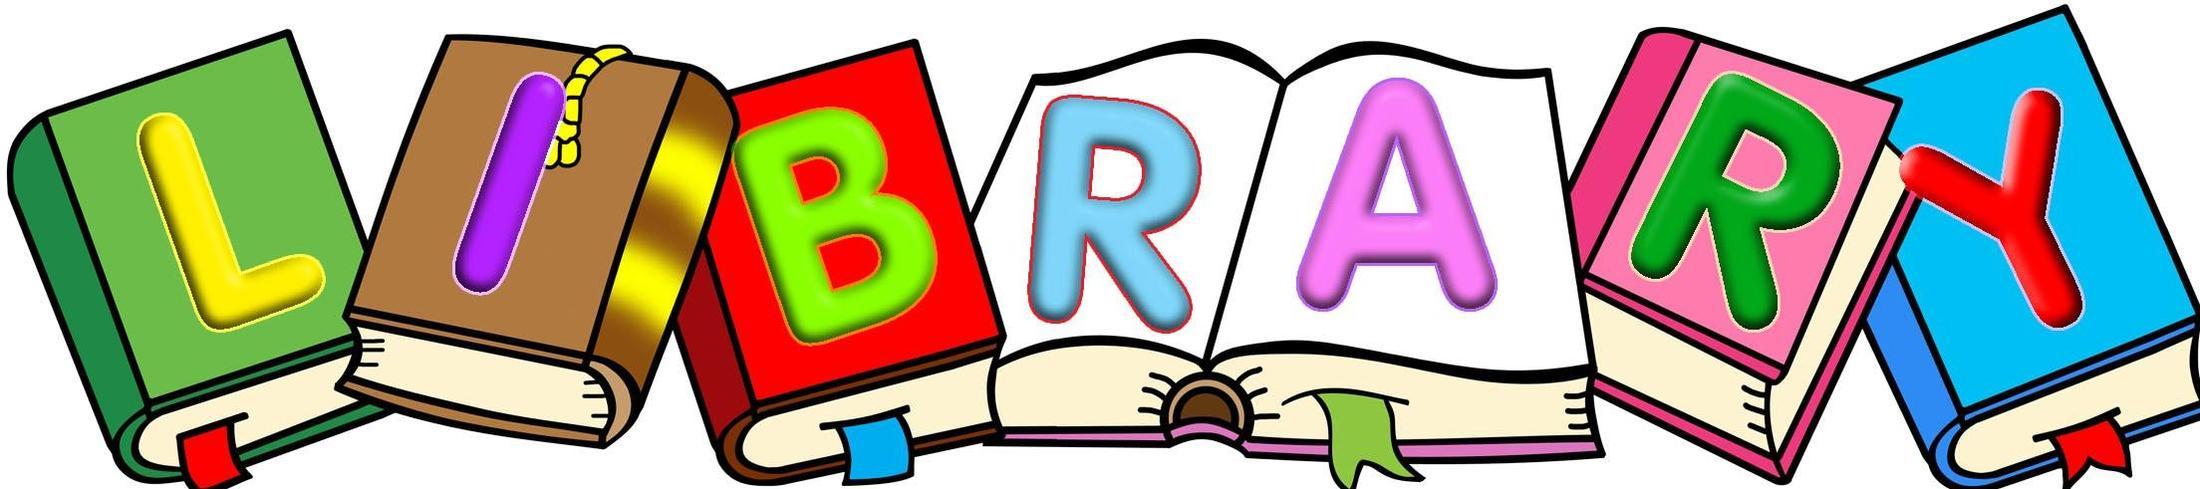 Library academic activities darby. Librarian clipart school principal